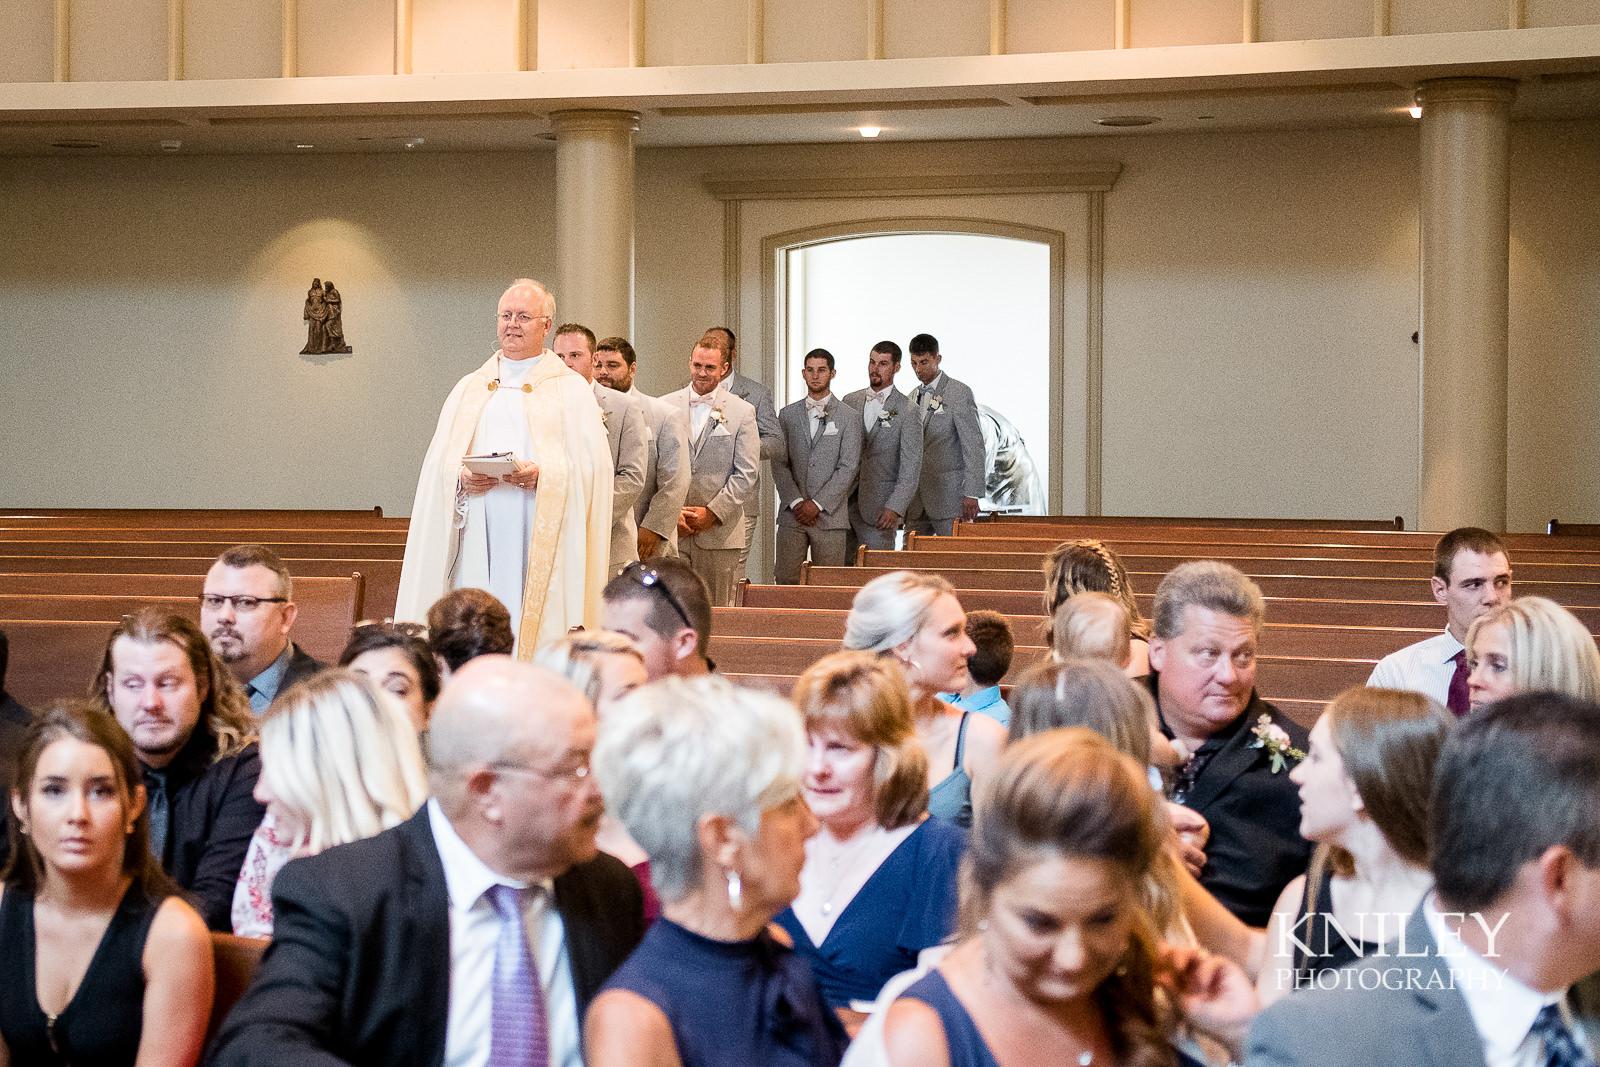 047 - Buffalo NY wedding pictures - St Marys Church - XT2A6842.jpg